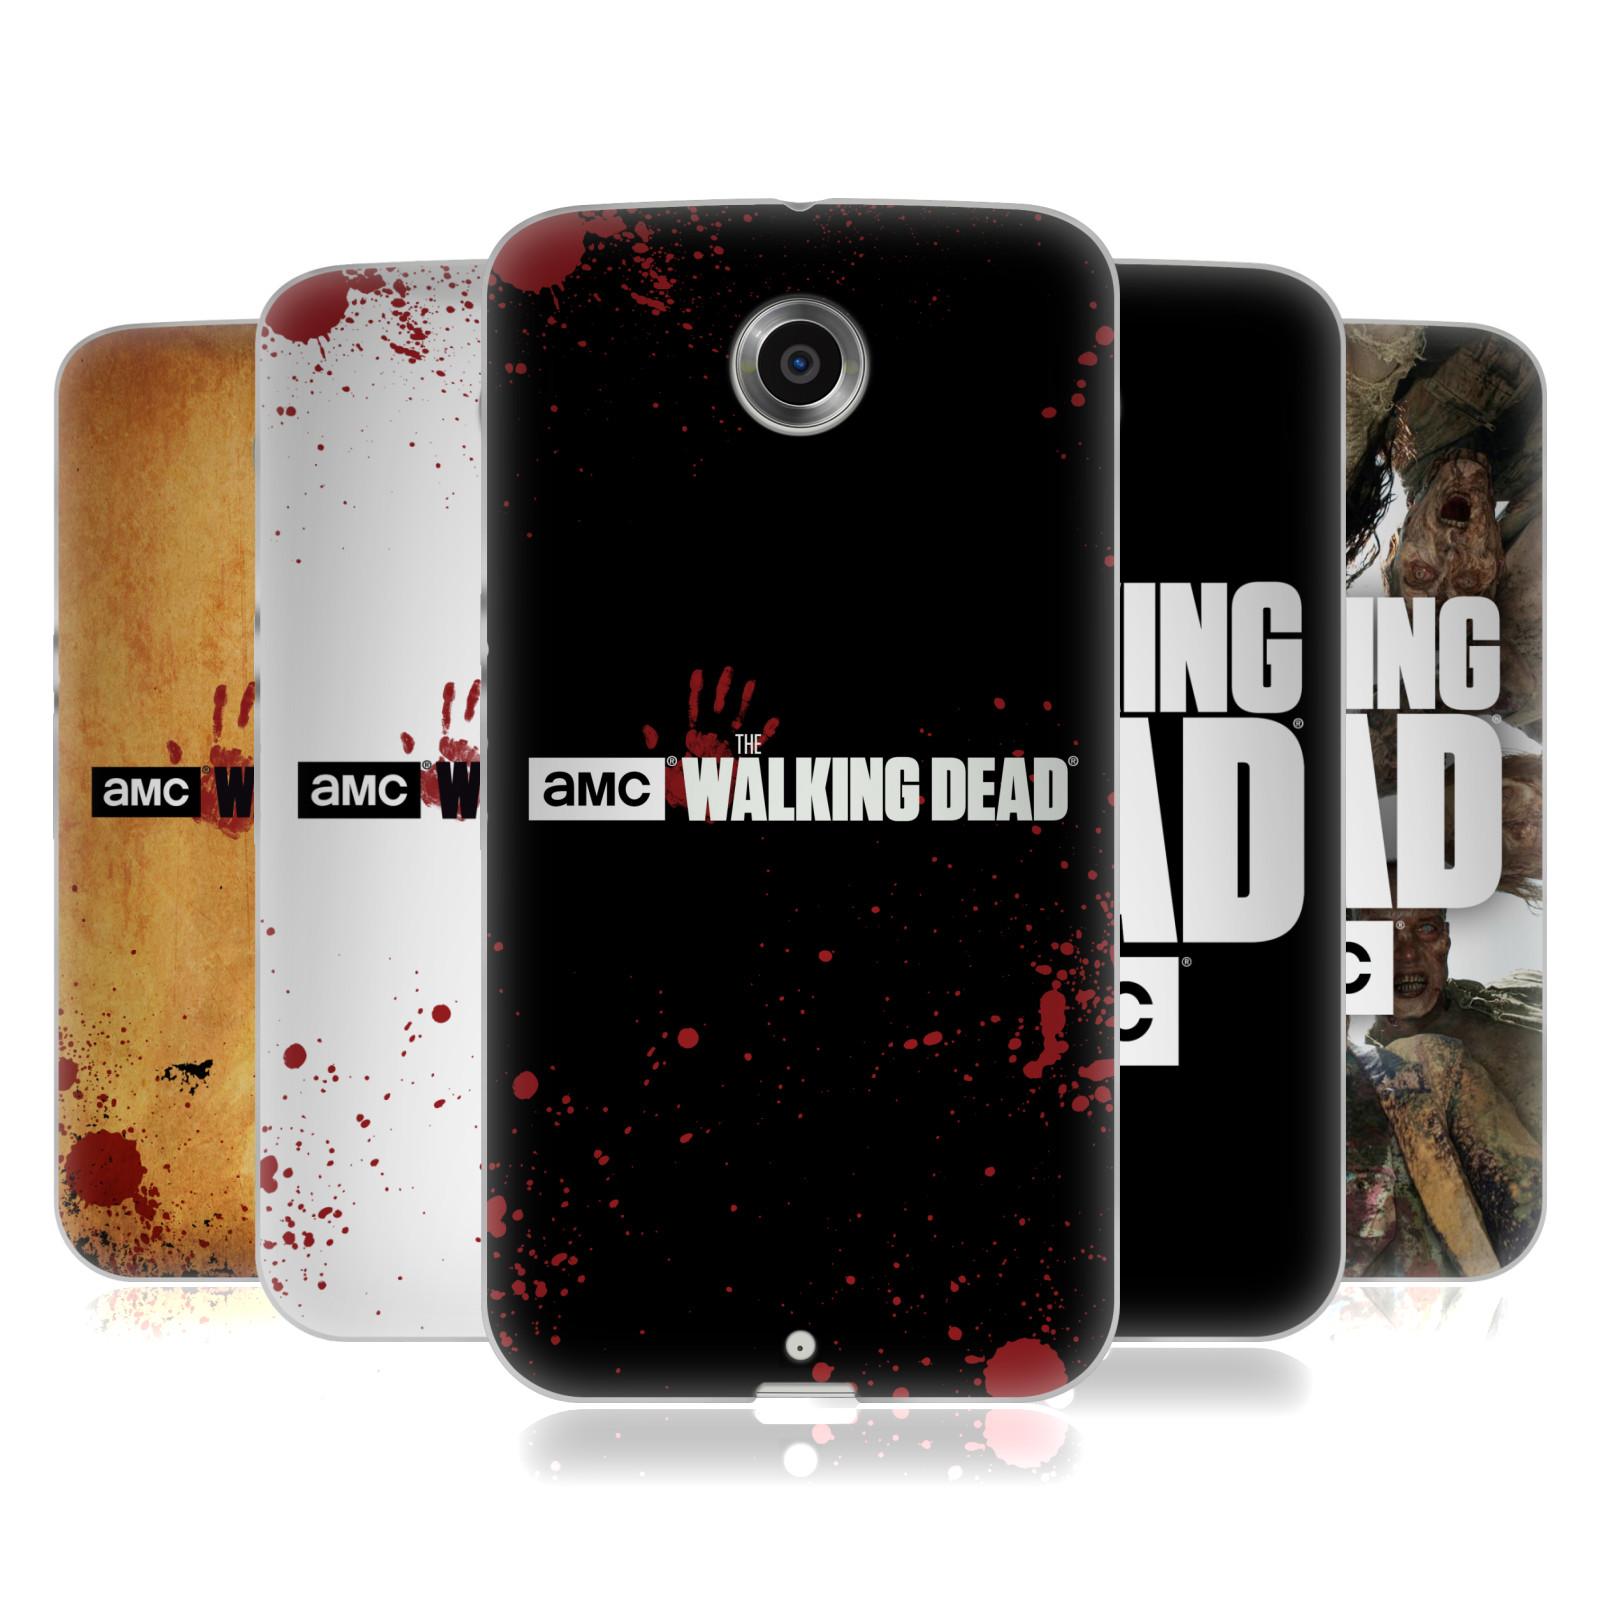 OFFICIAL AMC THE WALKING DEAD LOGO SOFT GEL CASE FOR ...